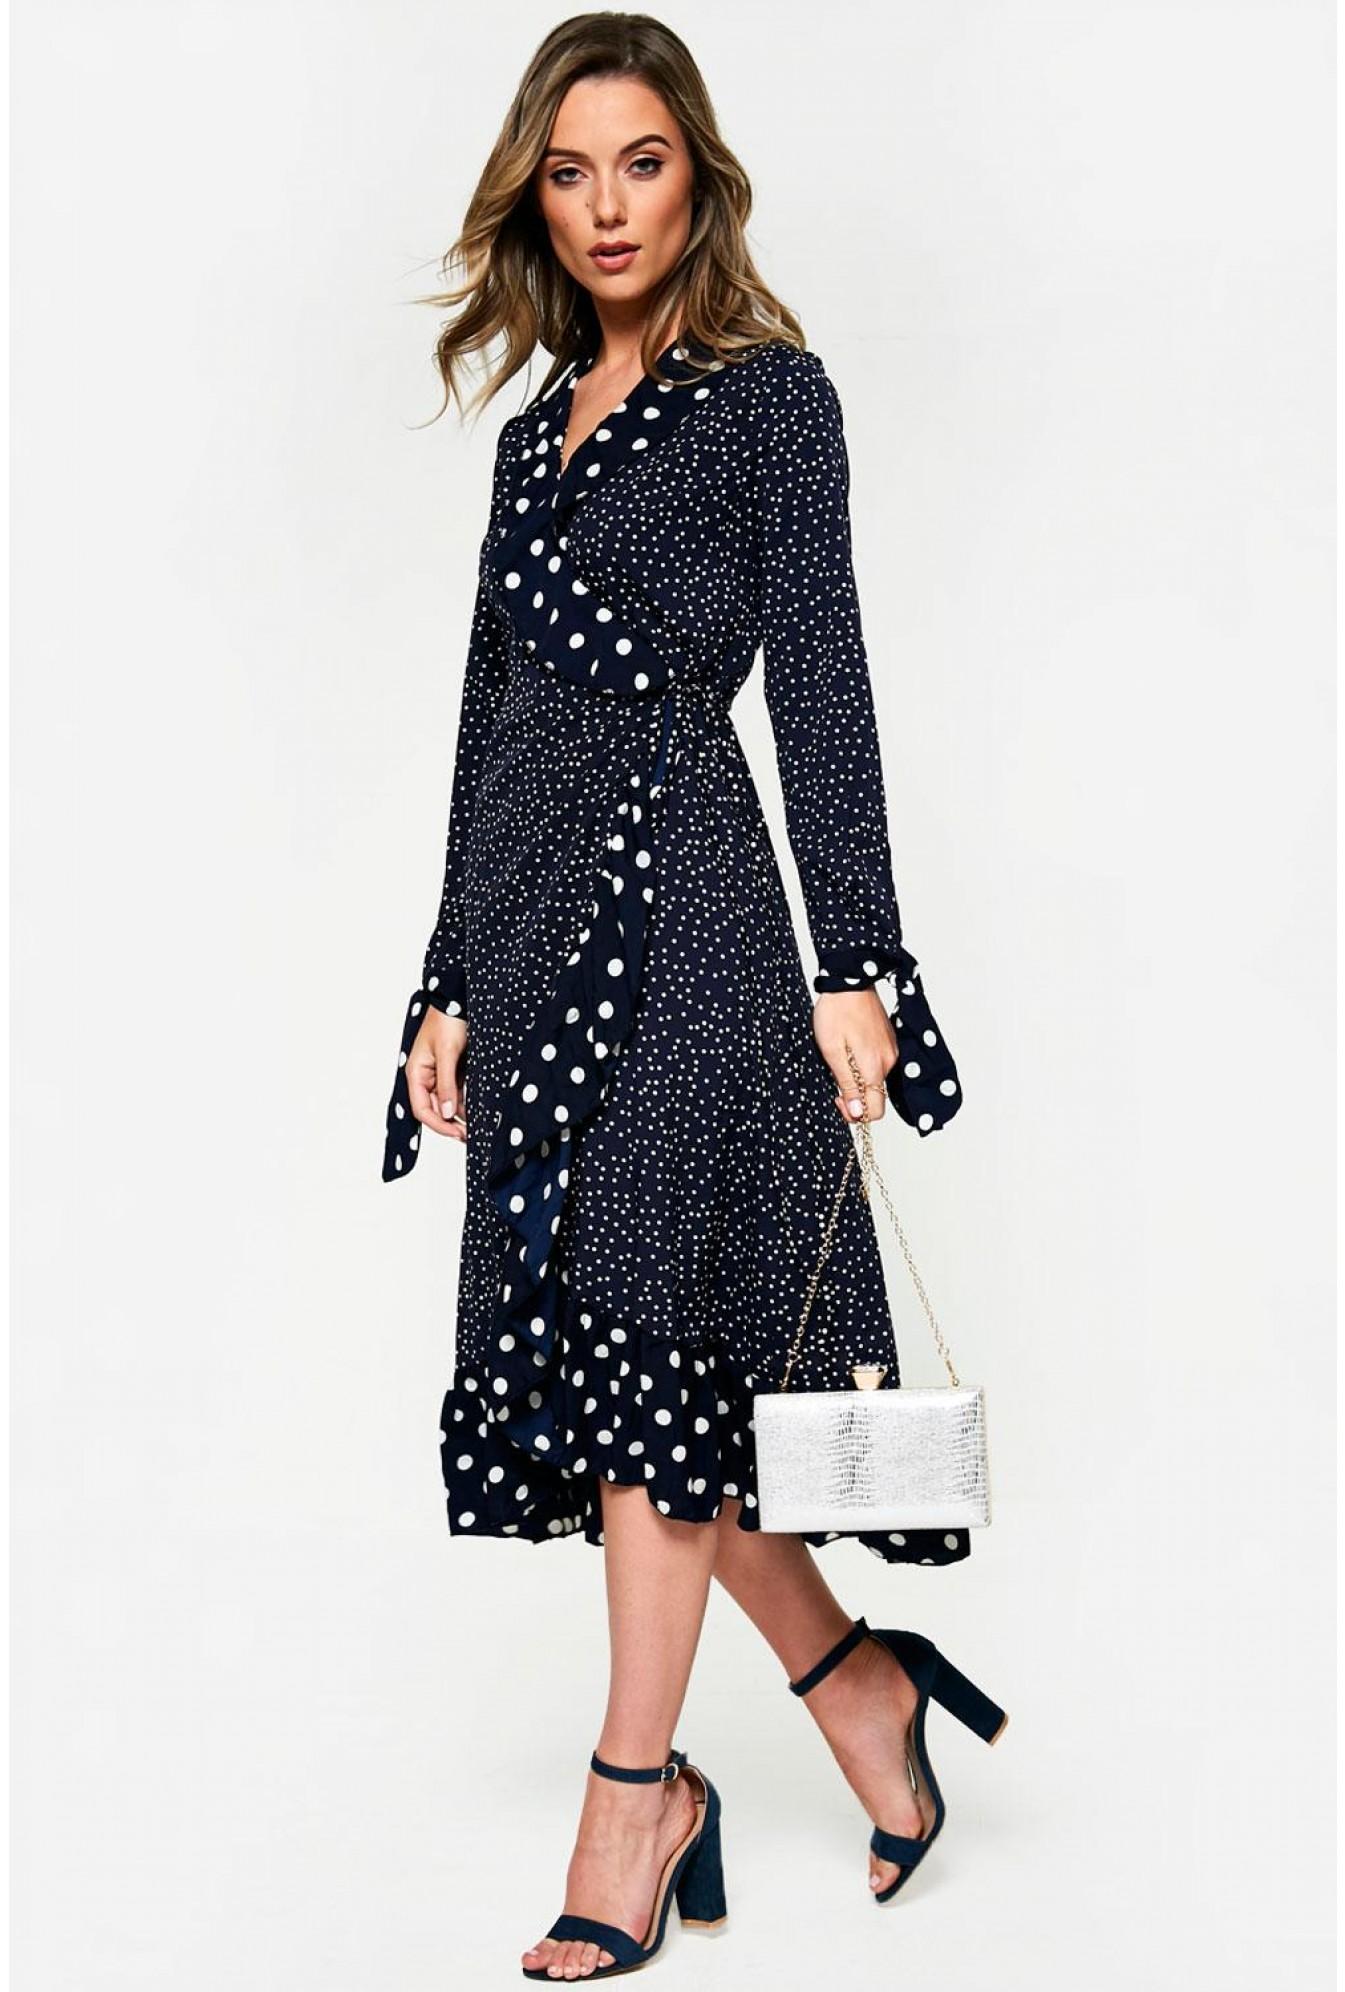 fbbd132751041 Saint Maine Polka Dot Wrap Dress in Navy | iCLOTHING